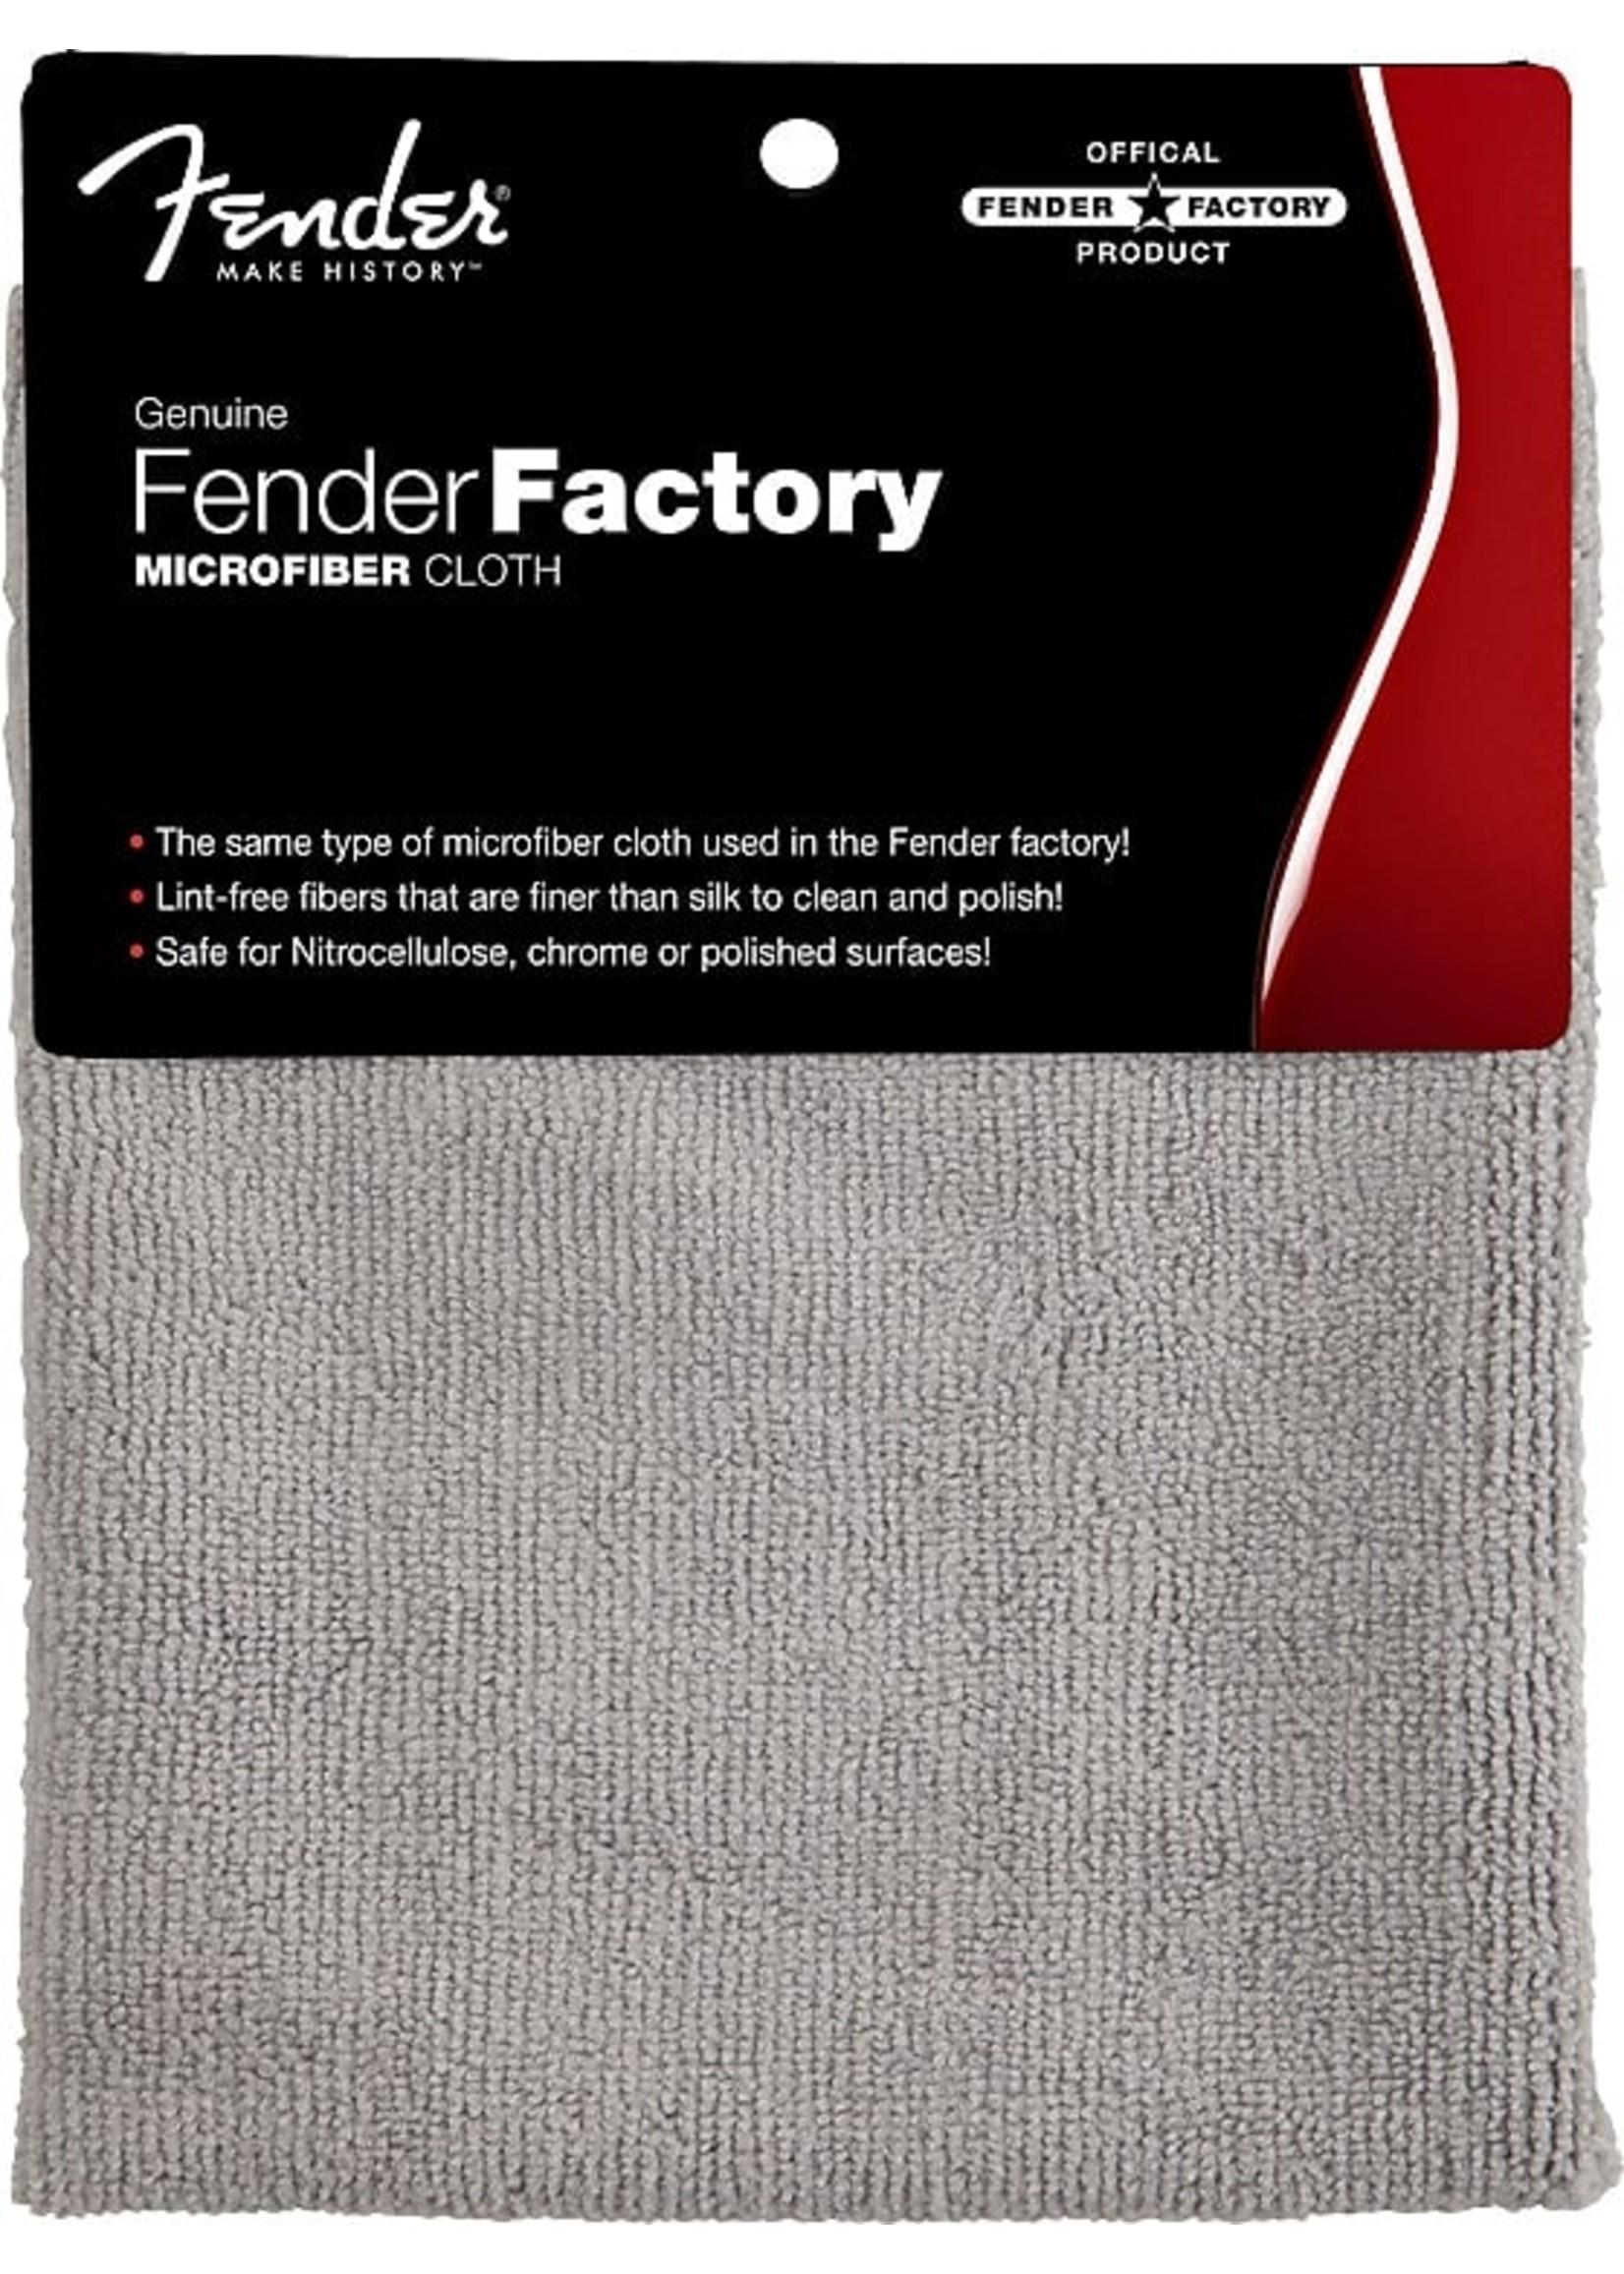 Fender Fender® Factory Microfiber Cloth, Gray